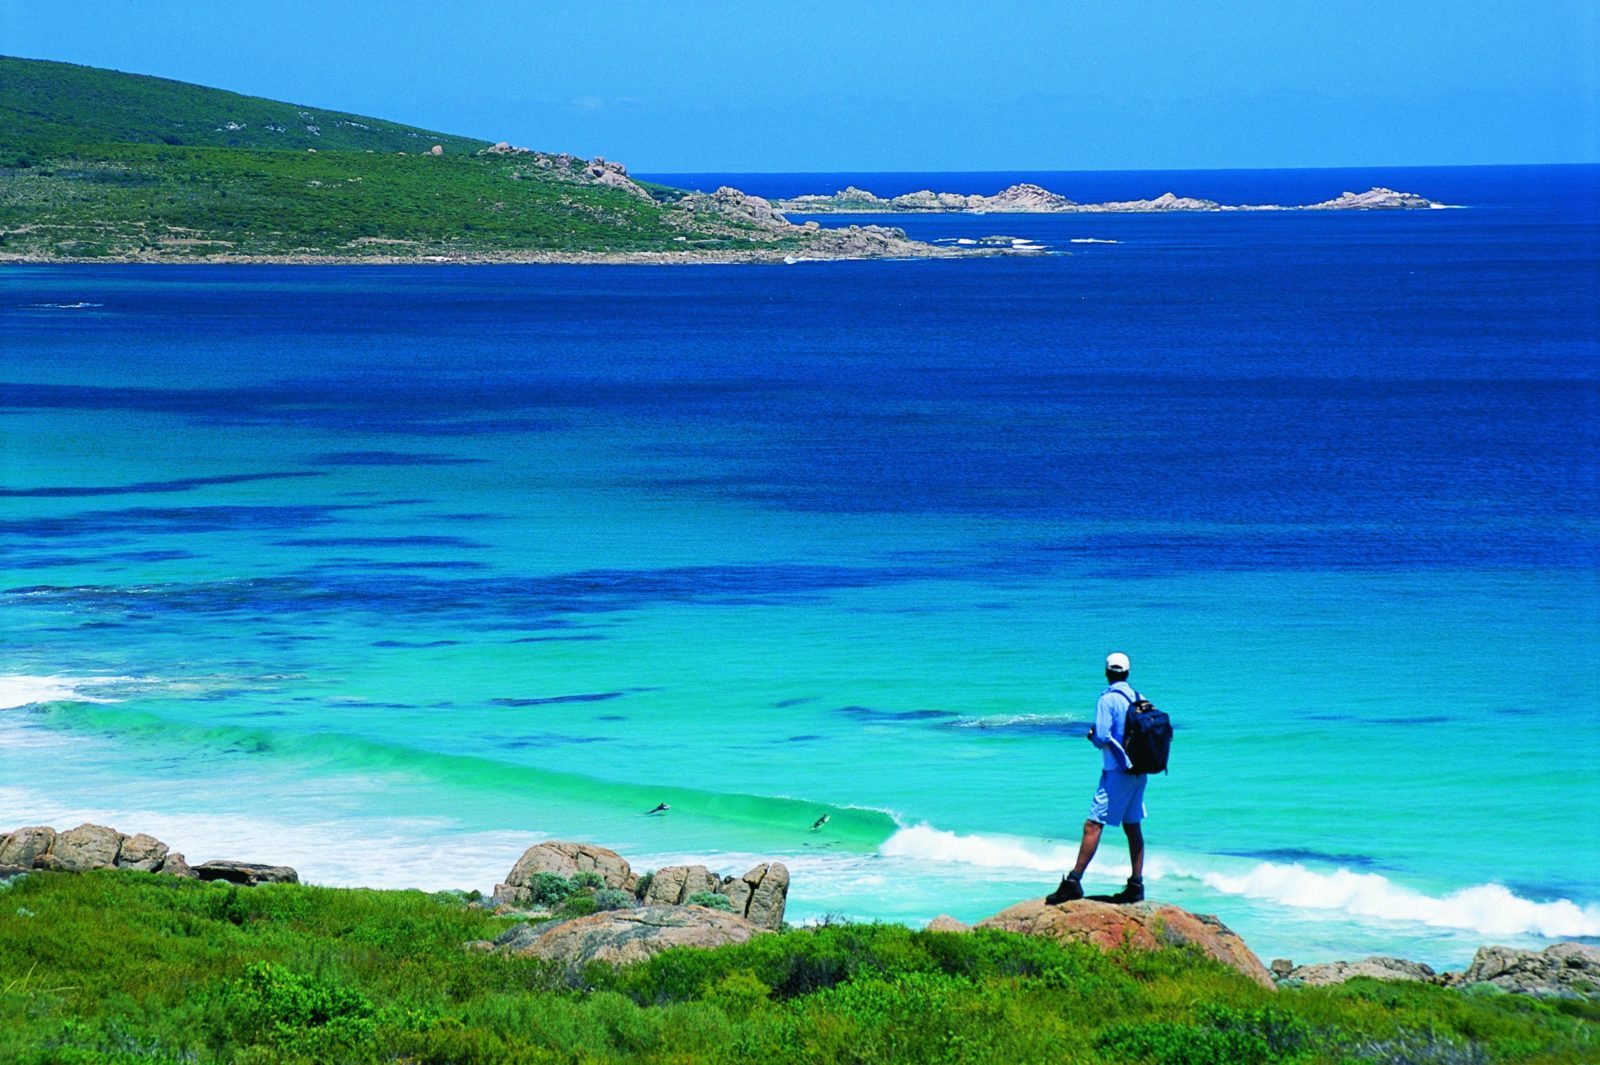 Smiths Beach, Yallingup, Western Australia